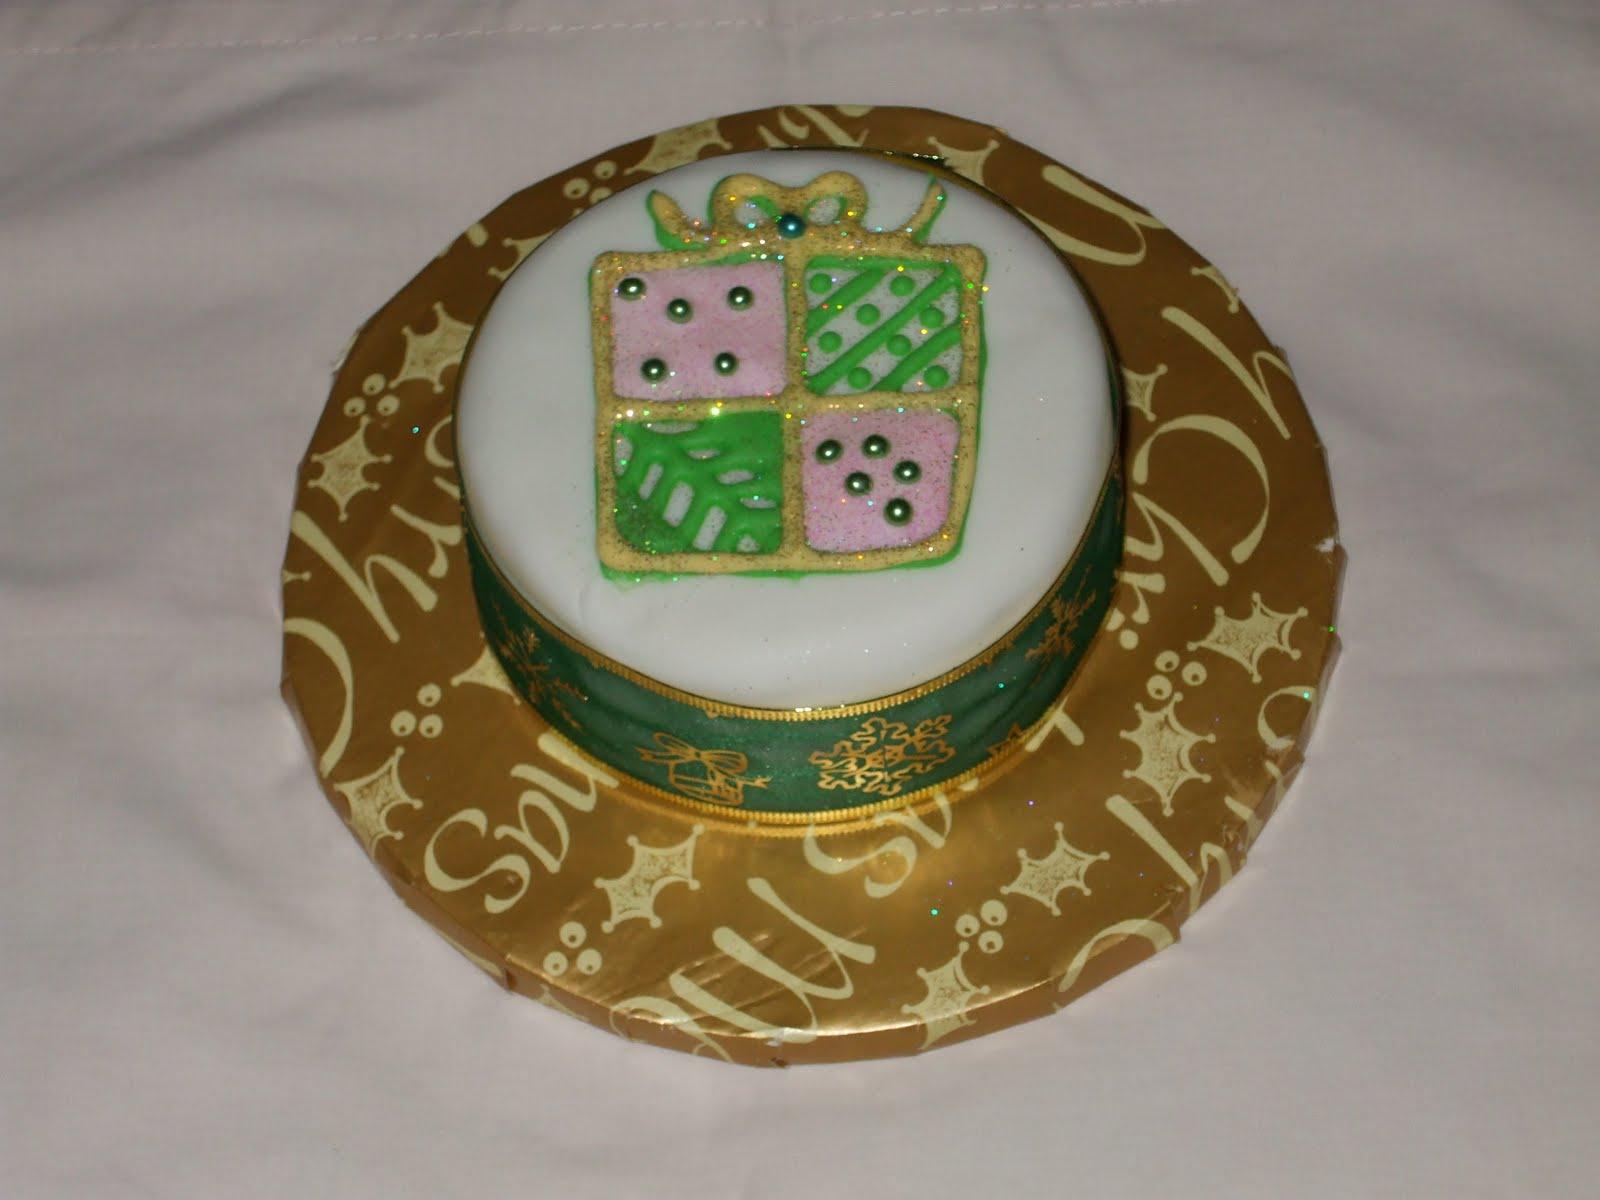 Mini Xmas Cake Designs : Fun Decorating: More Mini Christmas Cakes - USD35